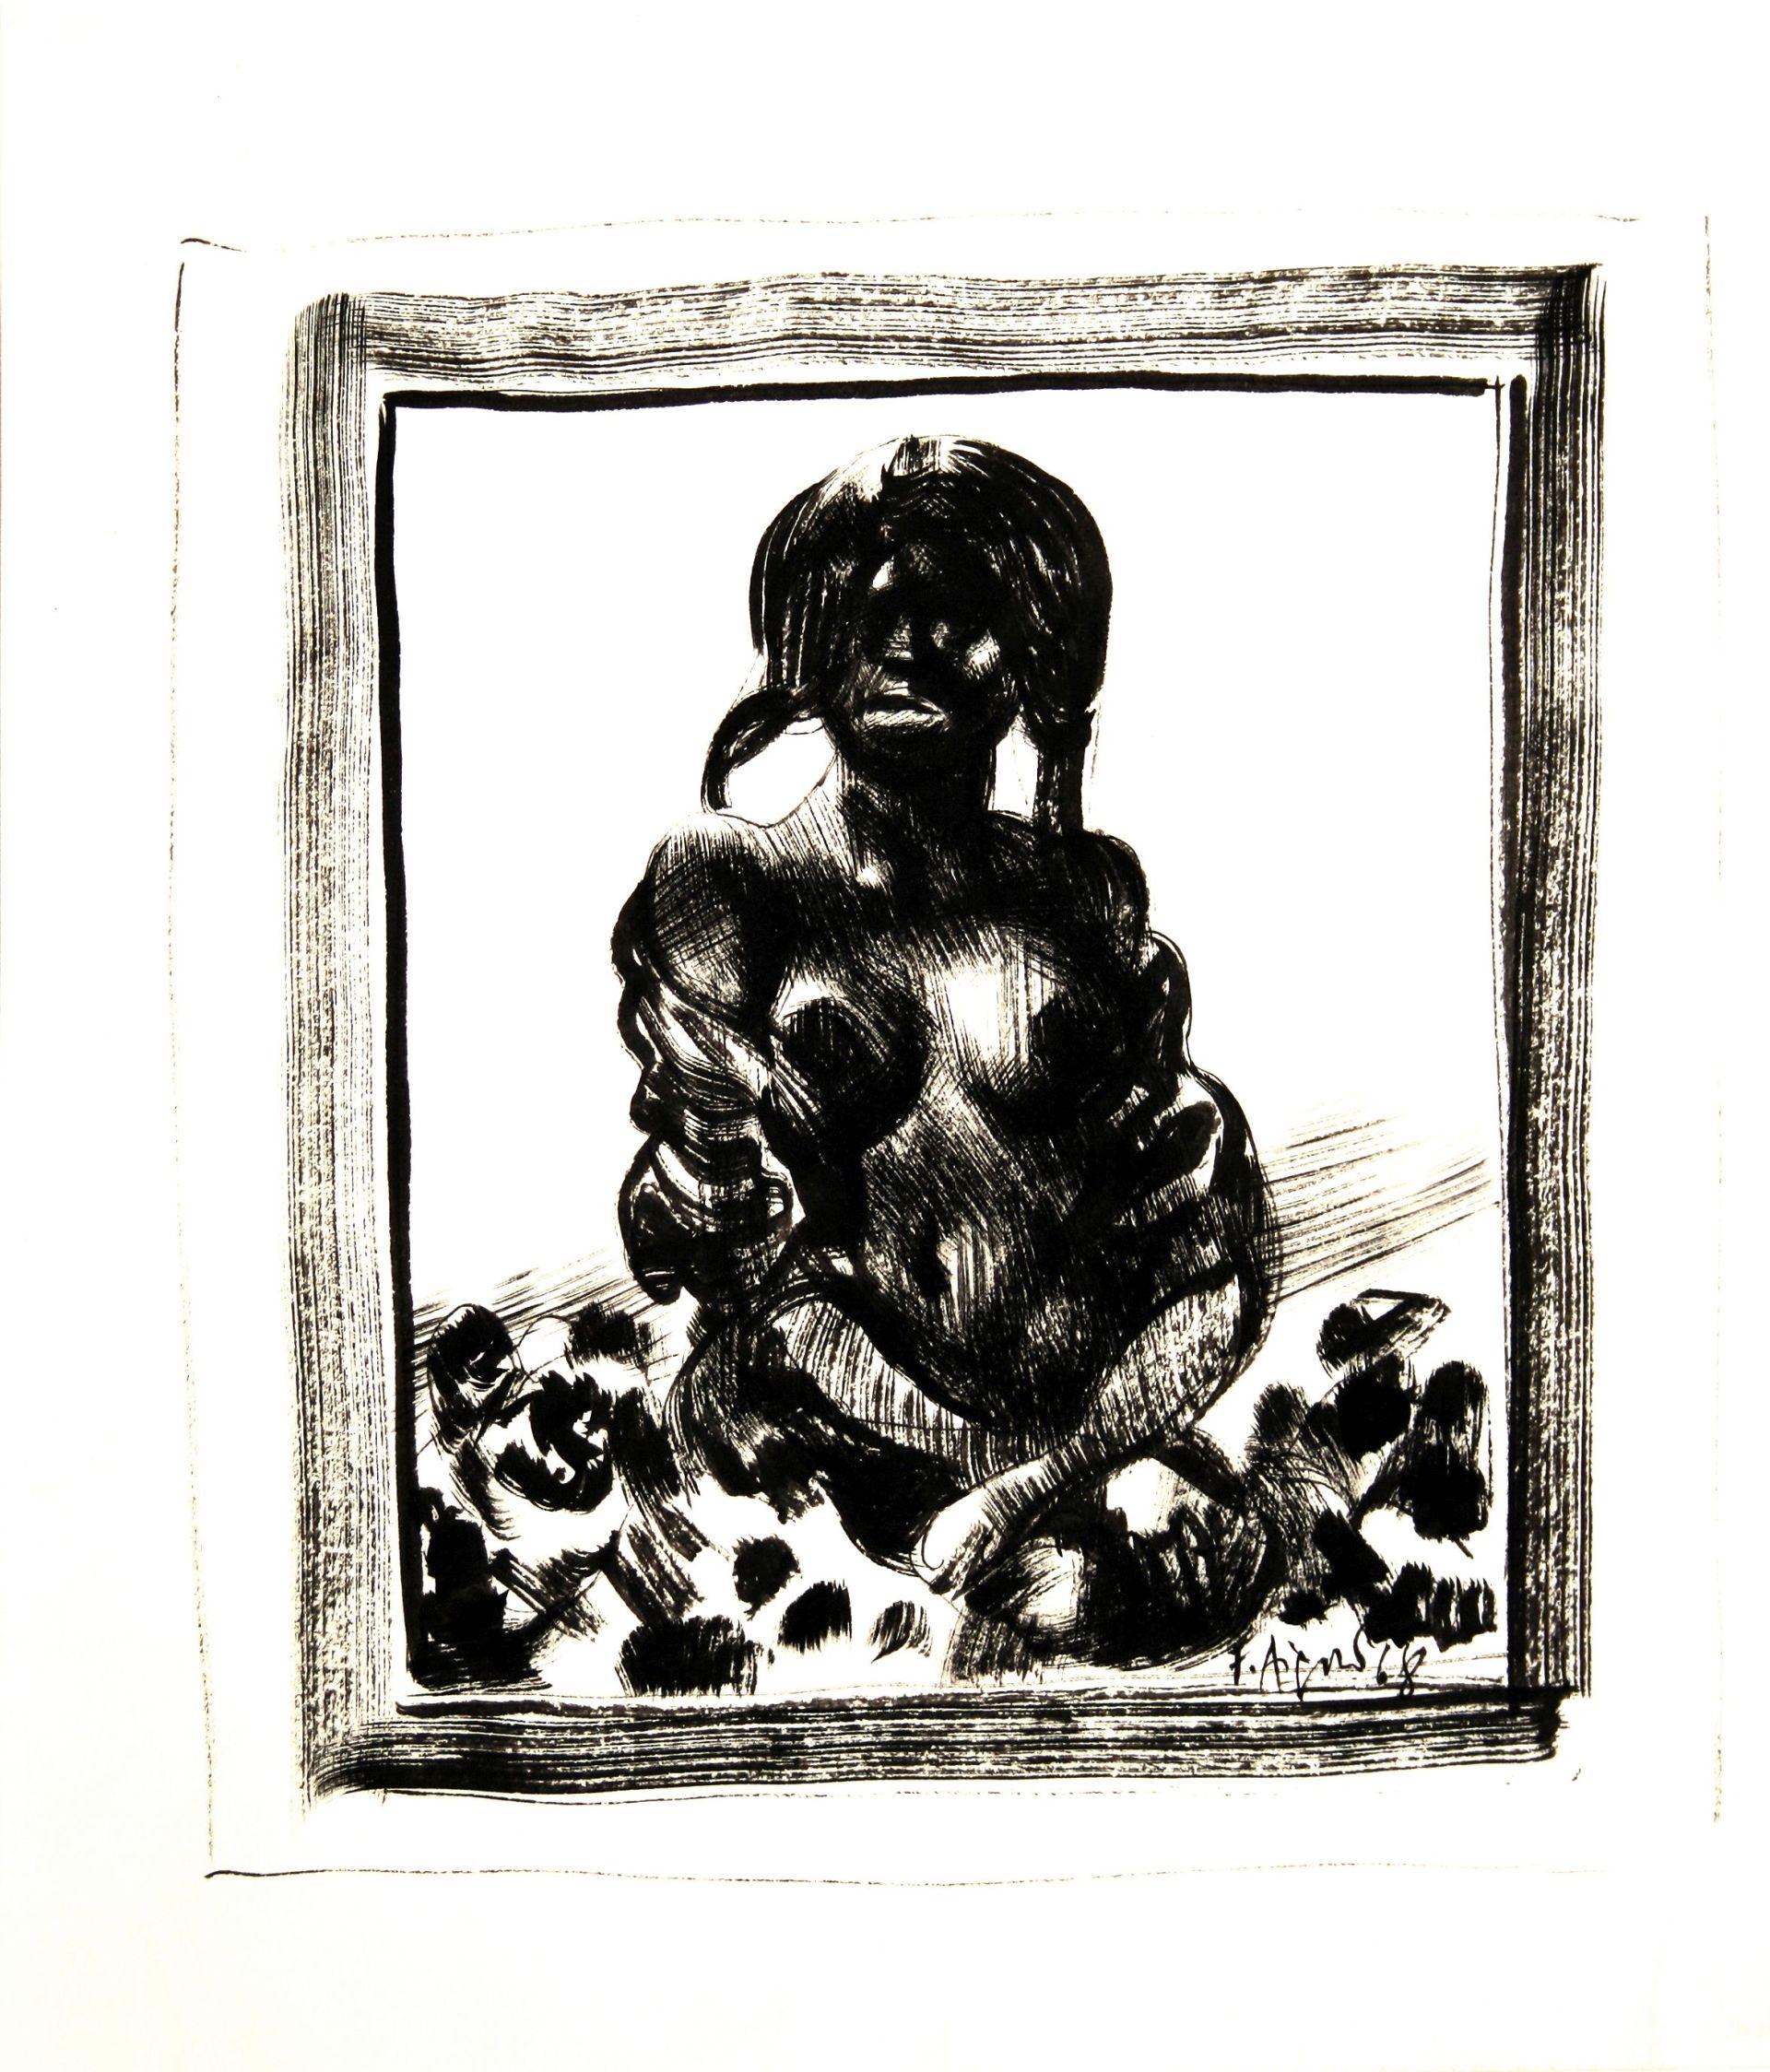 Fritz Aigner-Scantily clad Lady